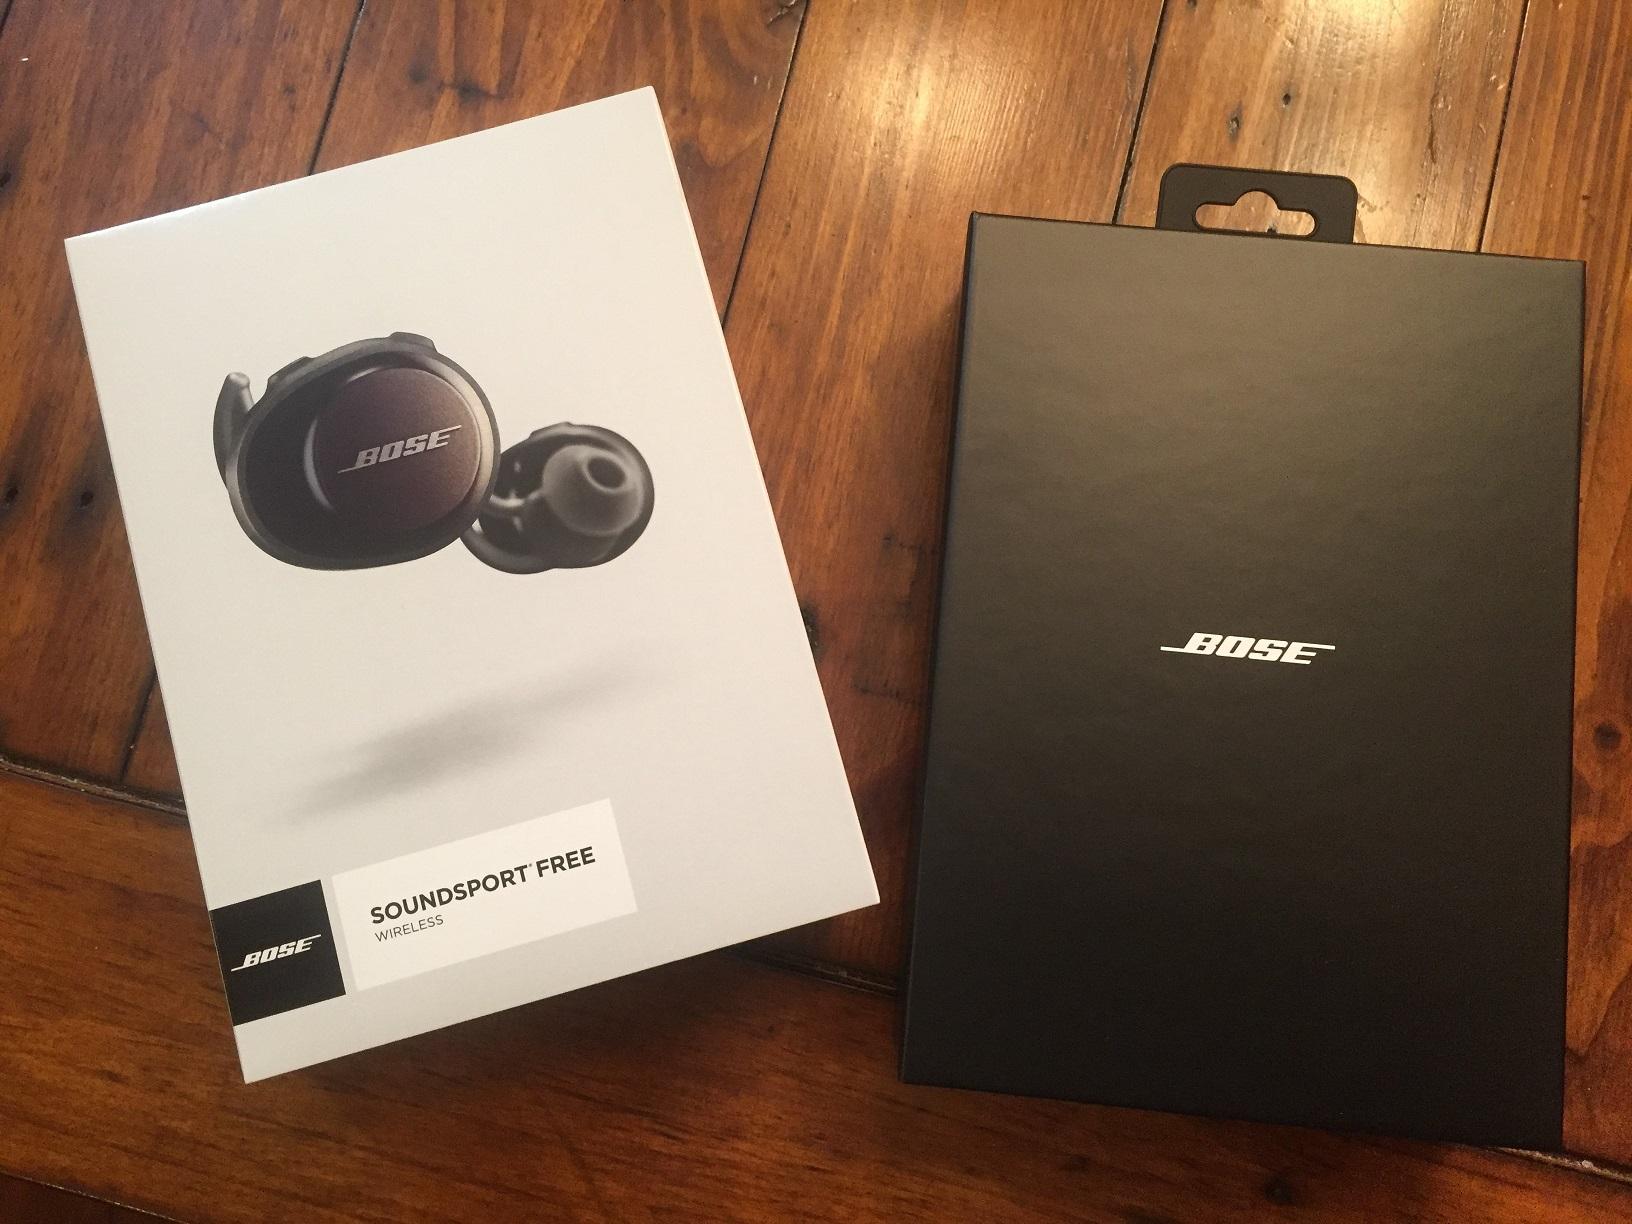 Review Bose Spoundsport Free Wireless Earbud Headphones